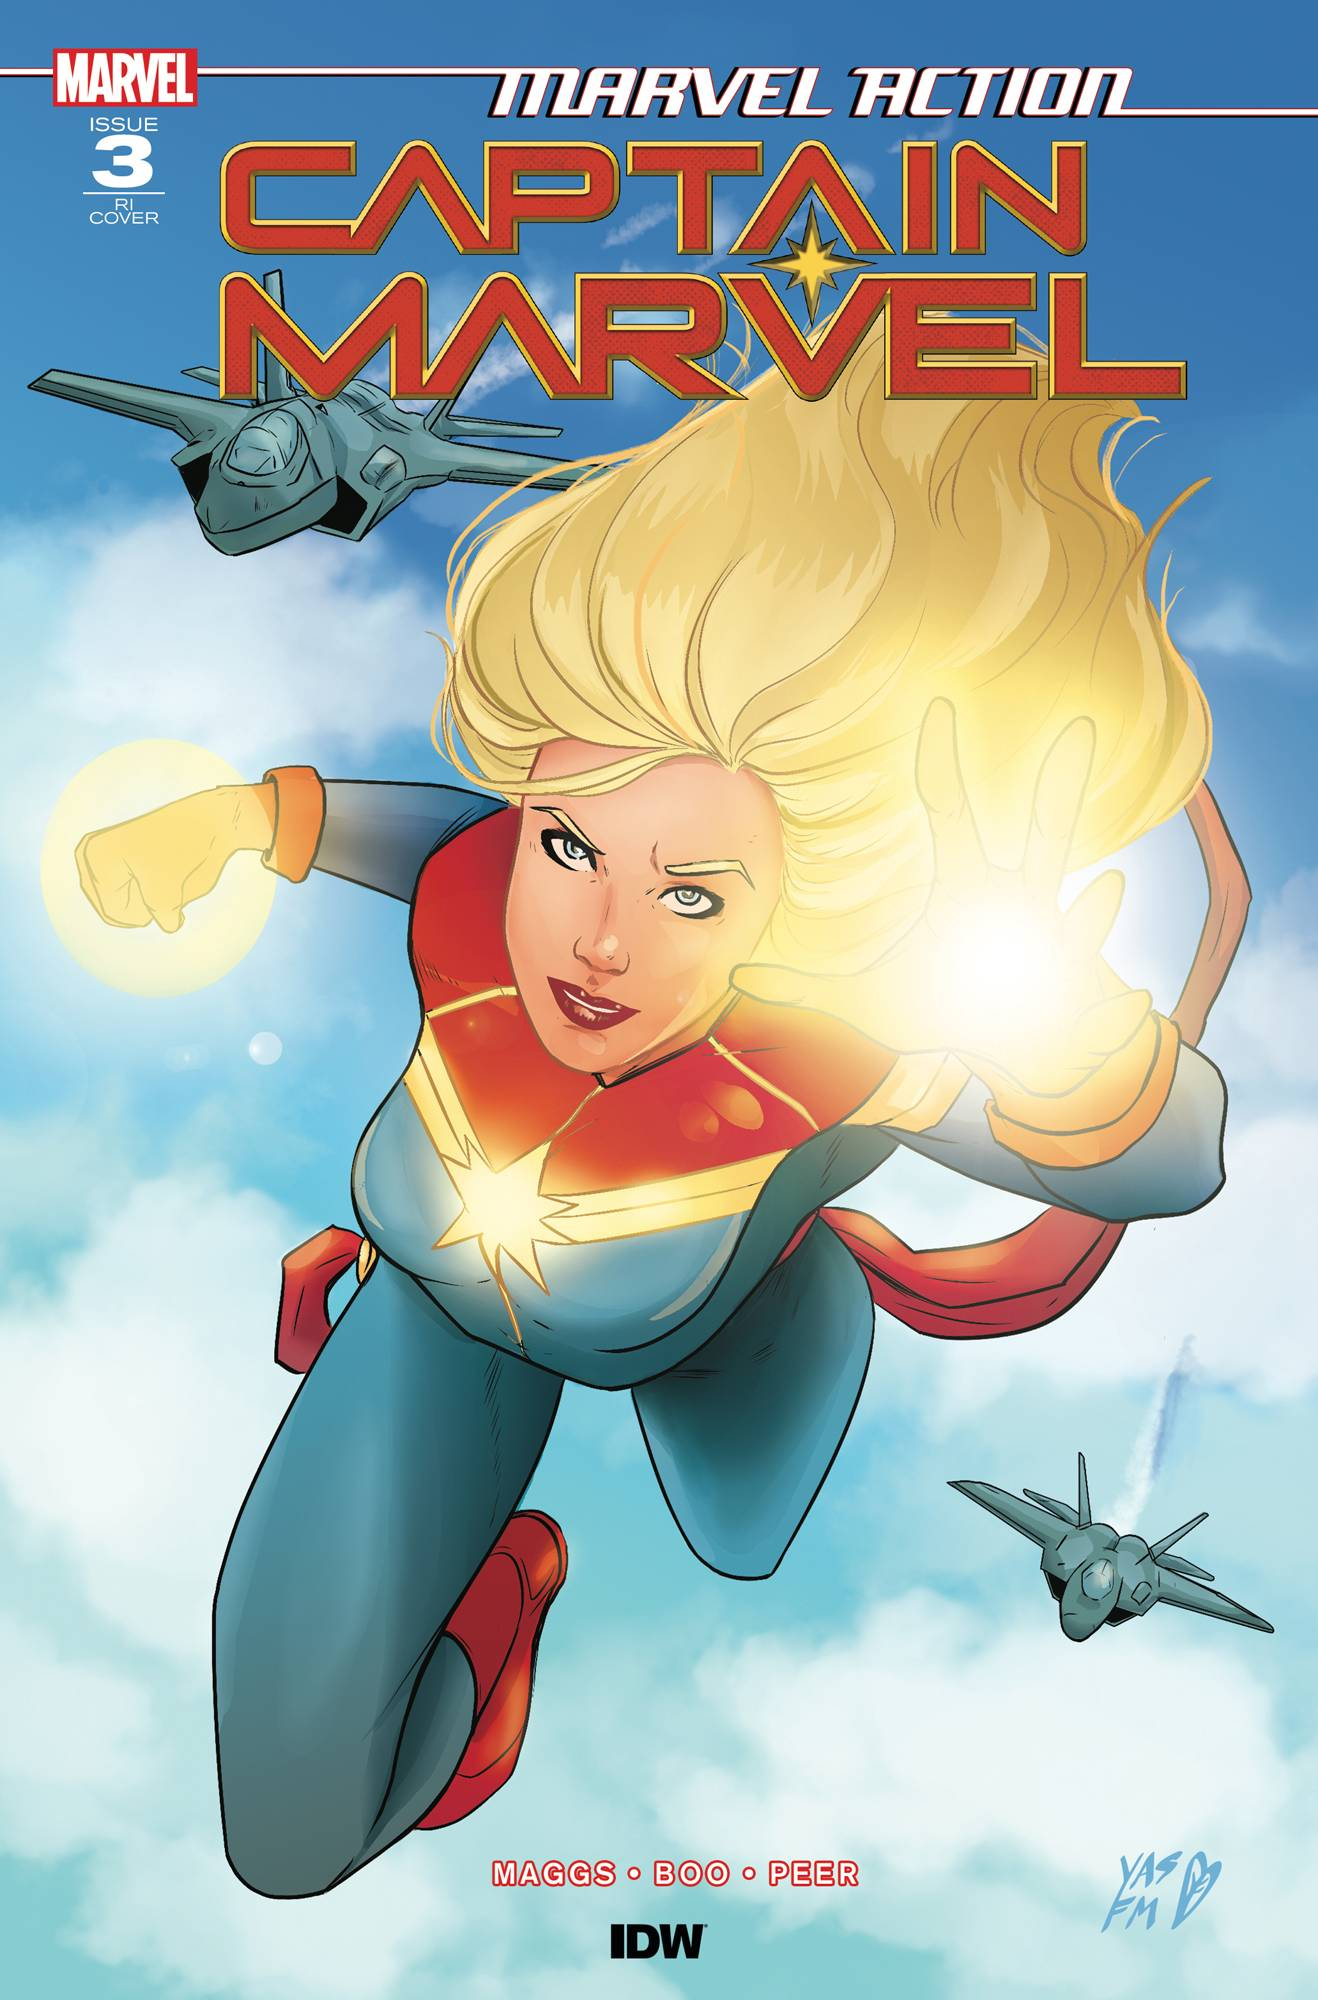 Marvel Action: Captain Marvel #3 (2019)